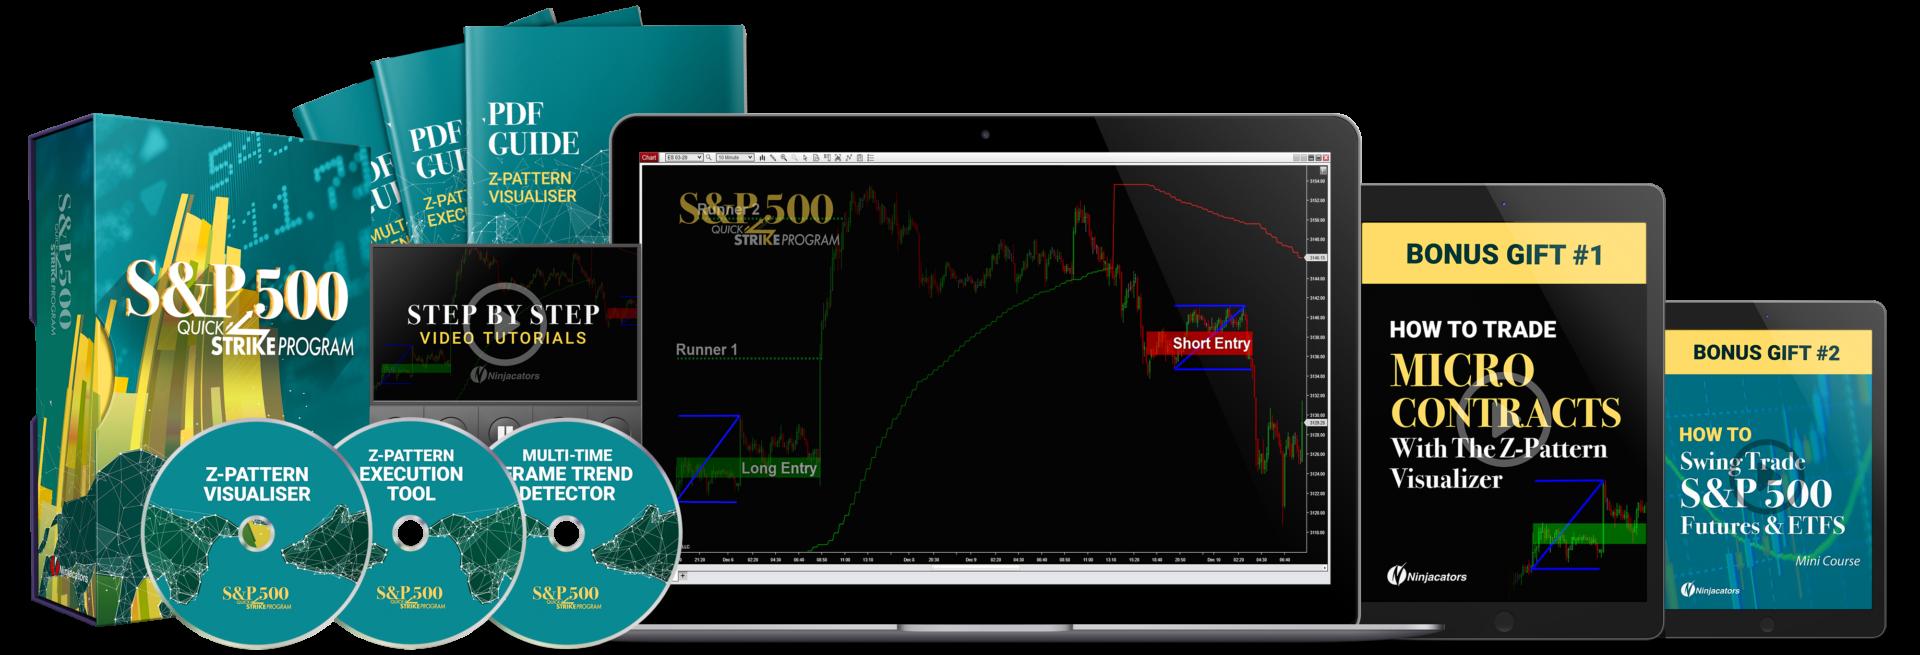 S&P 500 / ES Quick Strike